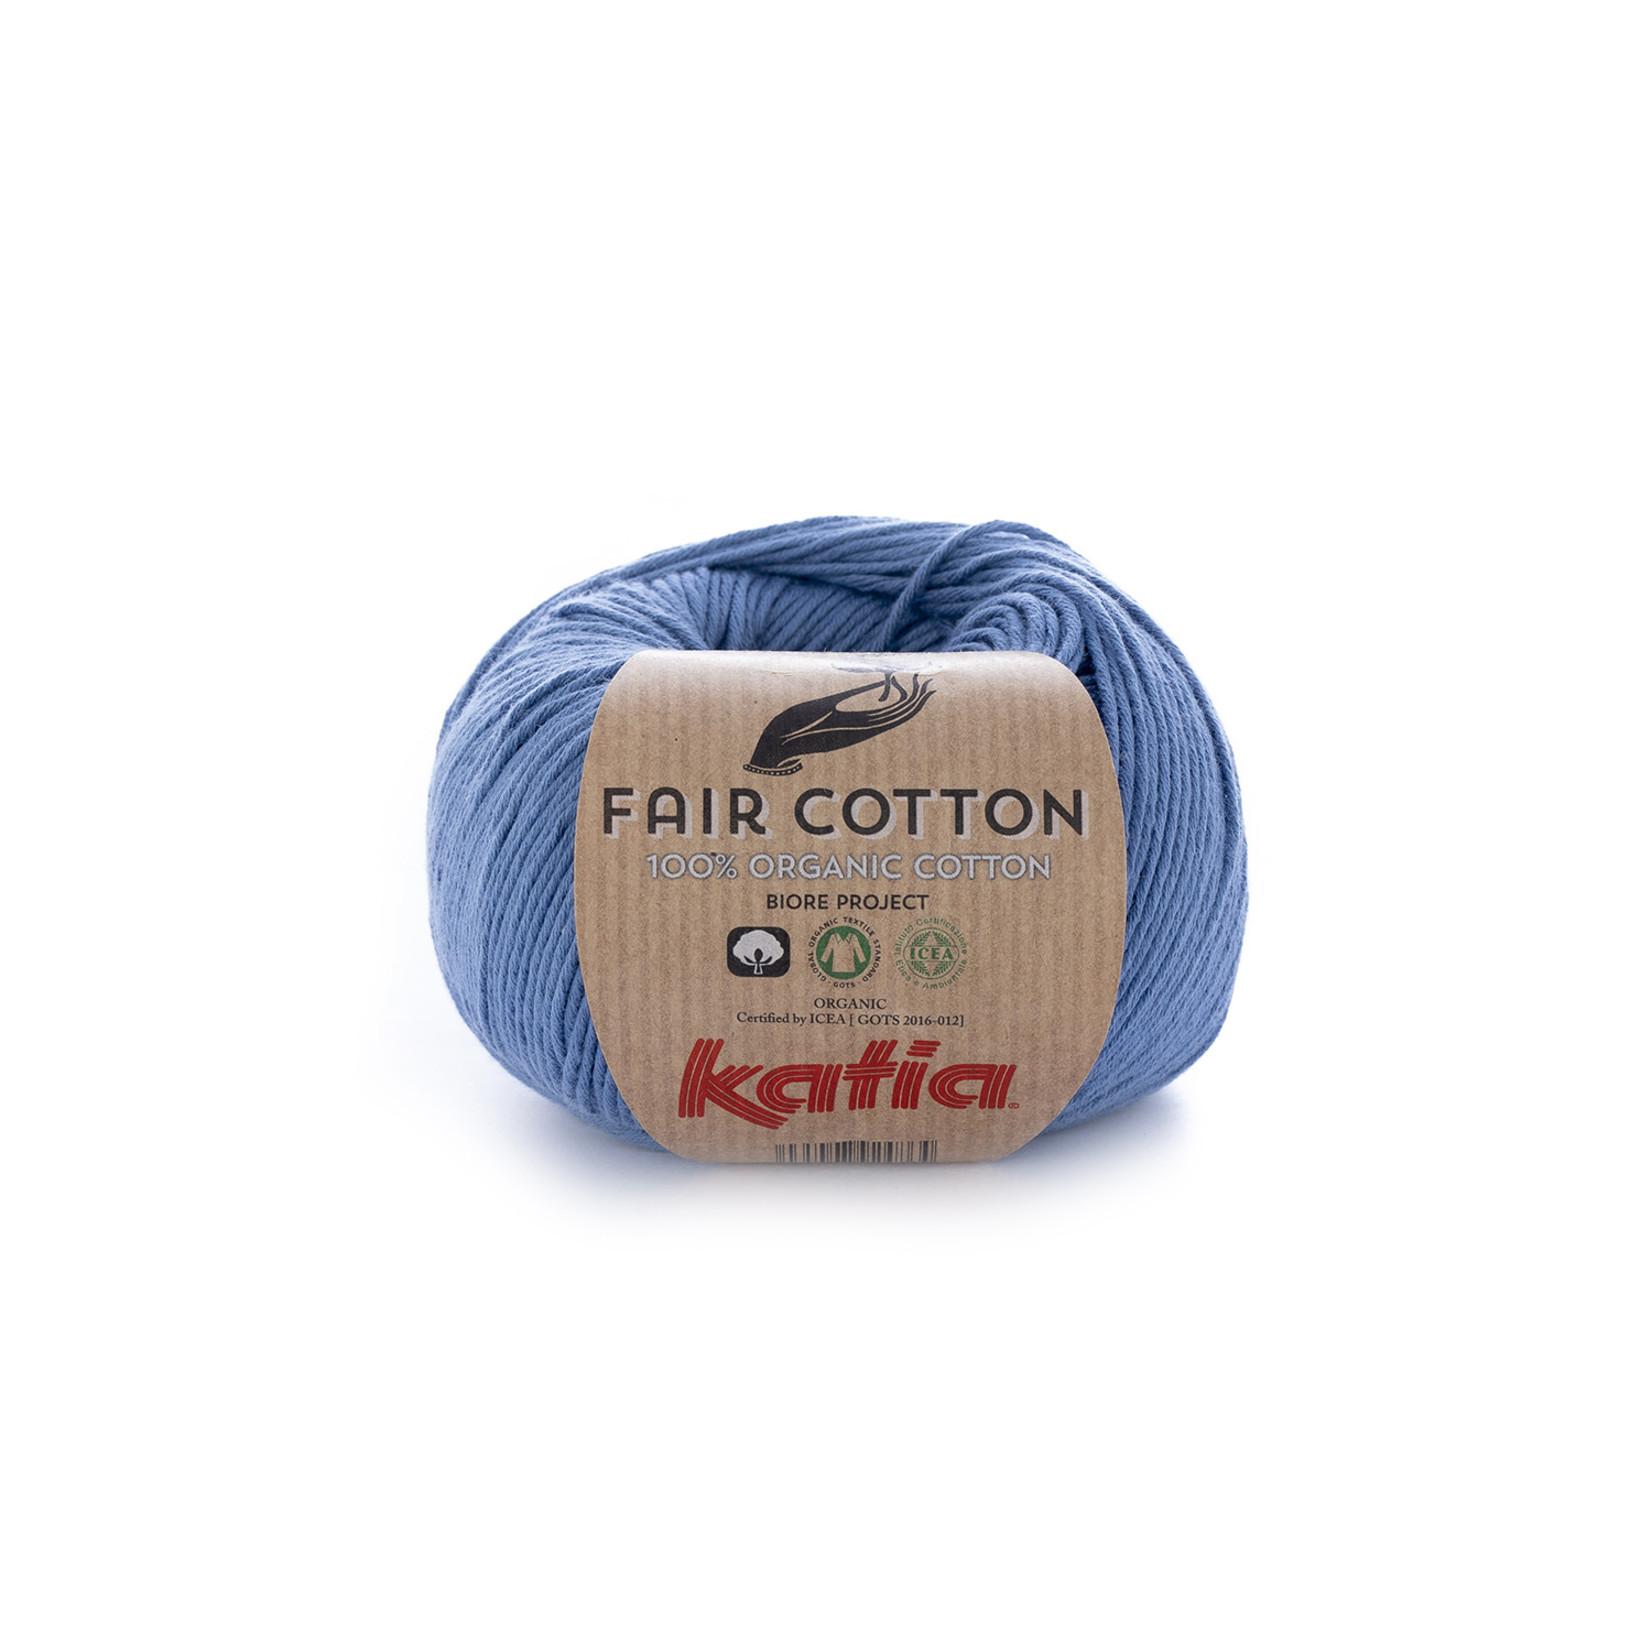 Katia Katia Fair Cotton 18 - jeans - 1 bol = 50 gr. = 155 m. - 100% biol. katoen